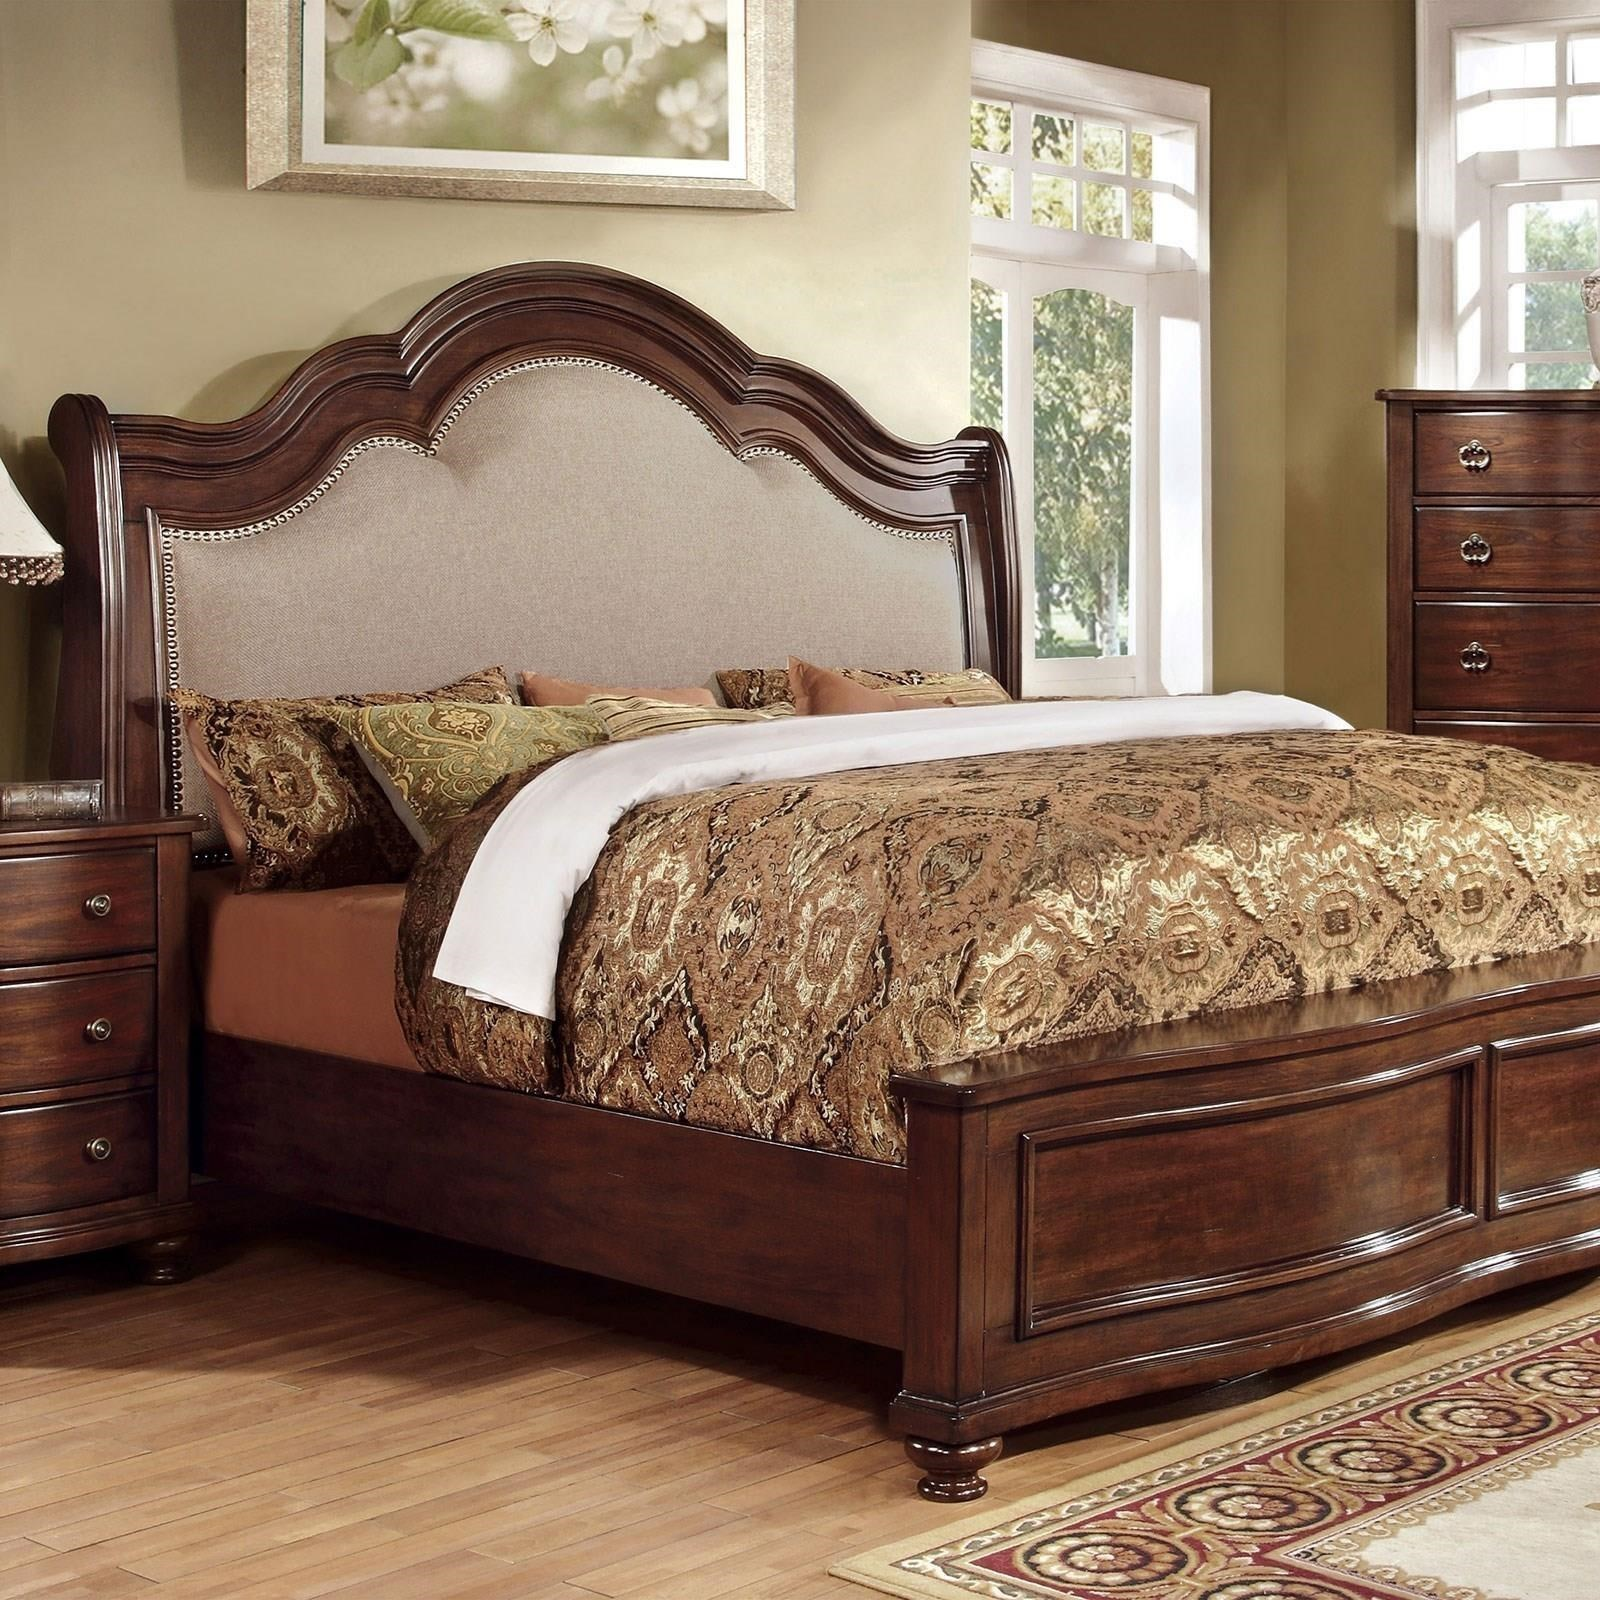 Bellavista California King Bed at Household Furniture